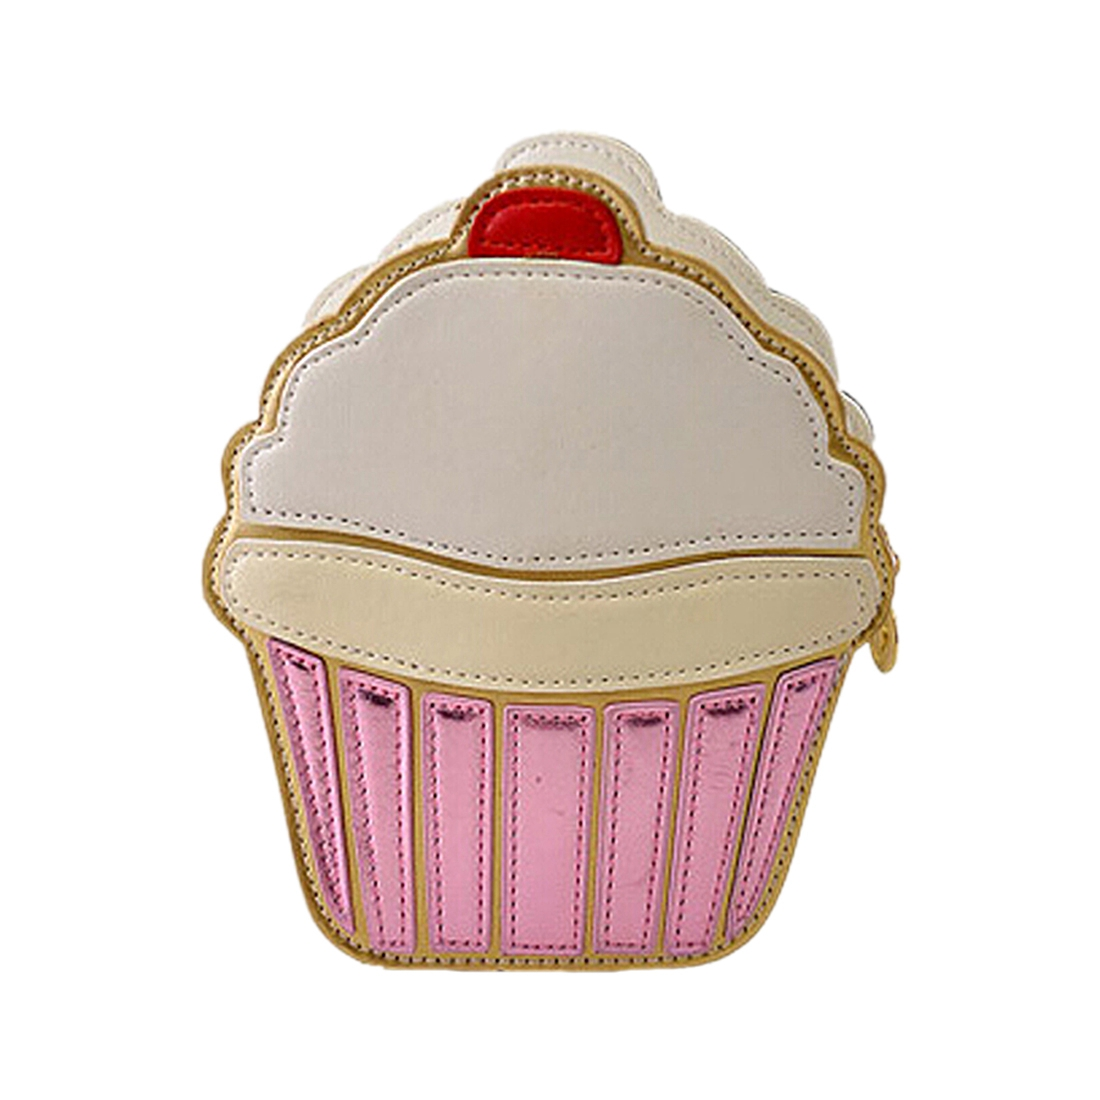 VSEN Hot New Cute Cartoon Women Ice cream Cupcake Mini Bags PU Leather Small Chain Clutch Crossbody Girl Shoulder Messenger ba